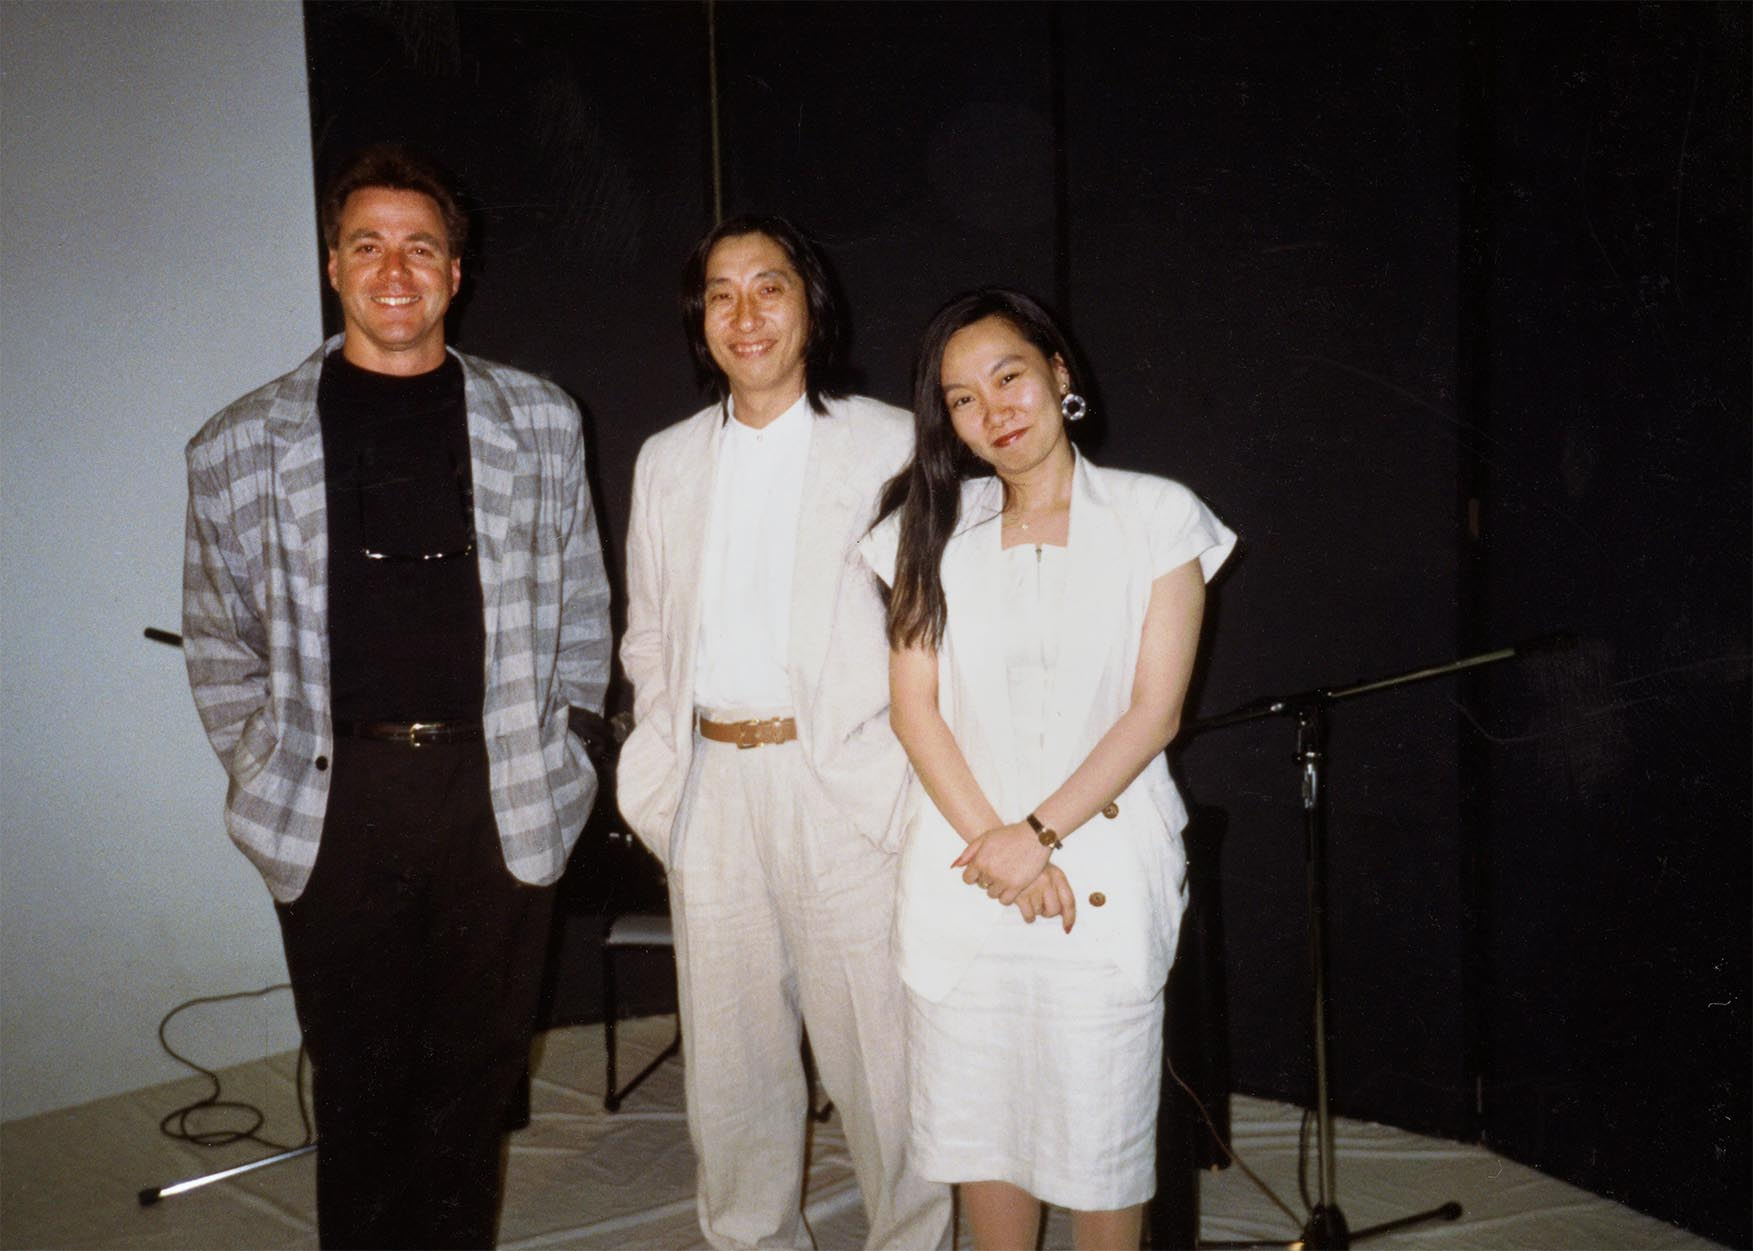 Jack Butler, Min Shirota, Osaka, Japan